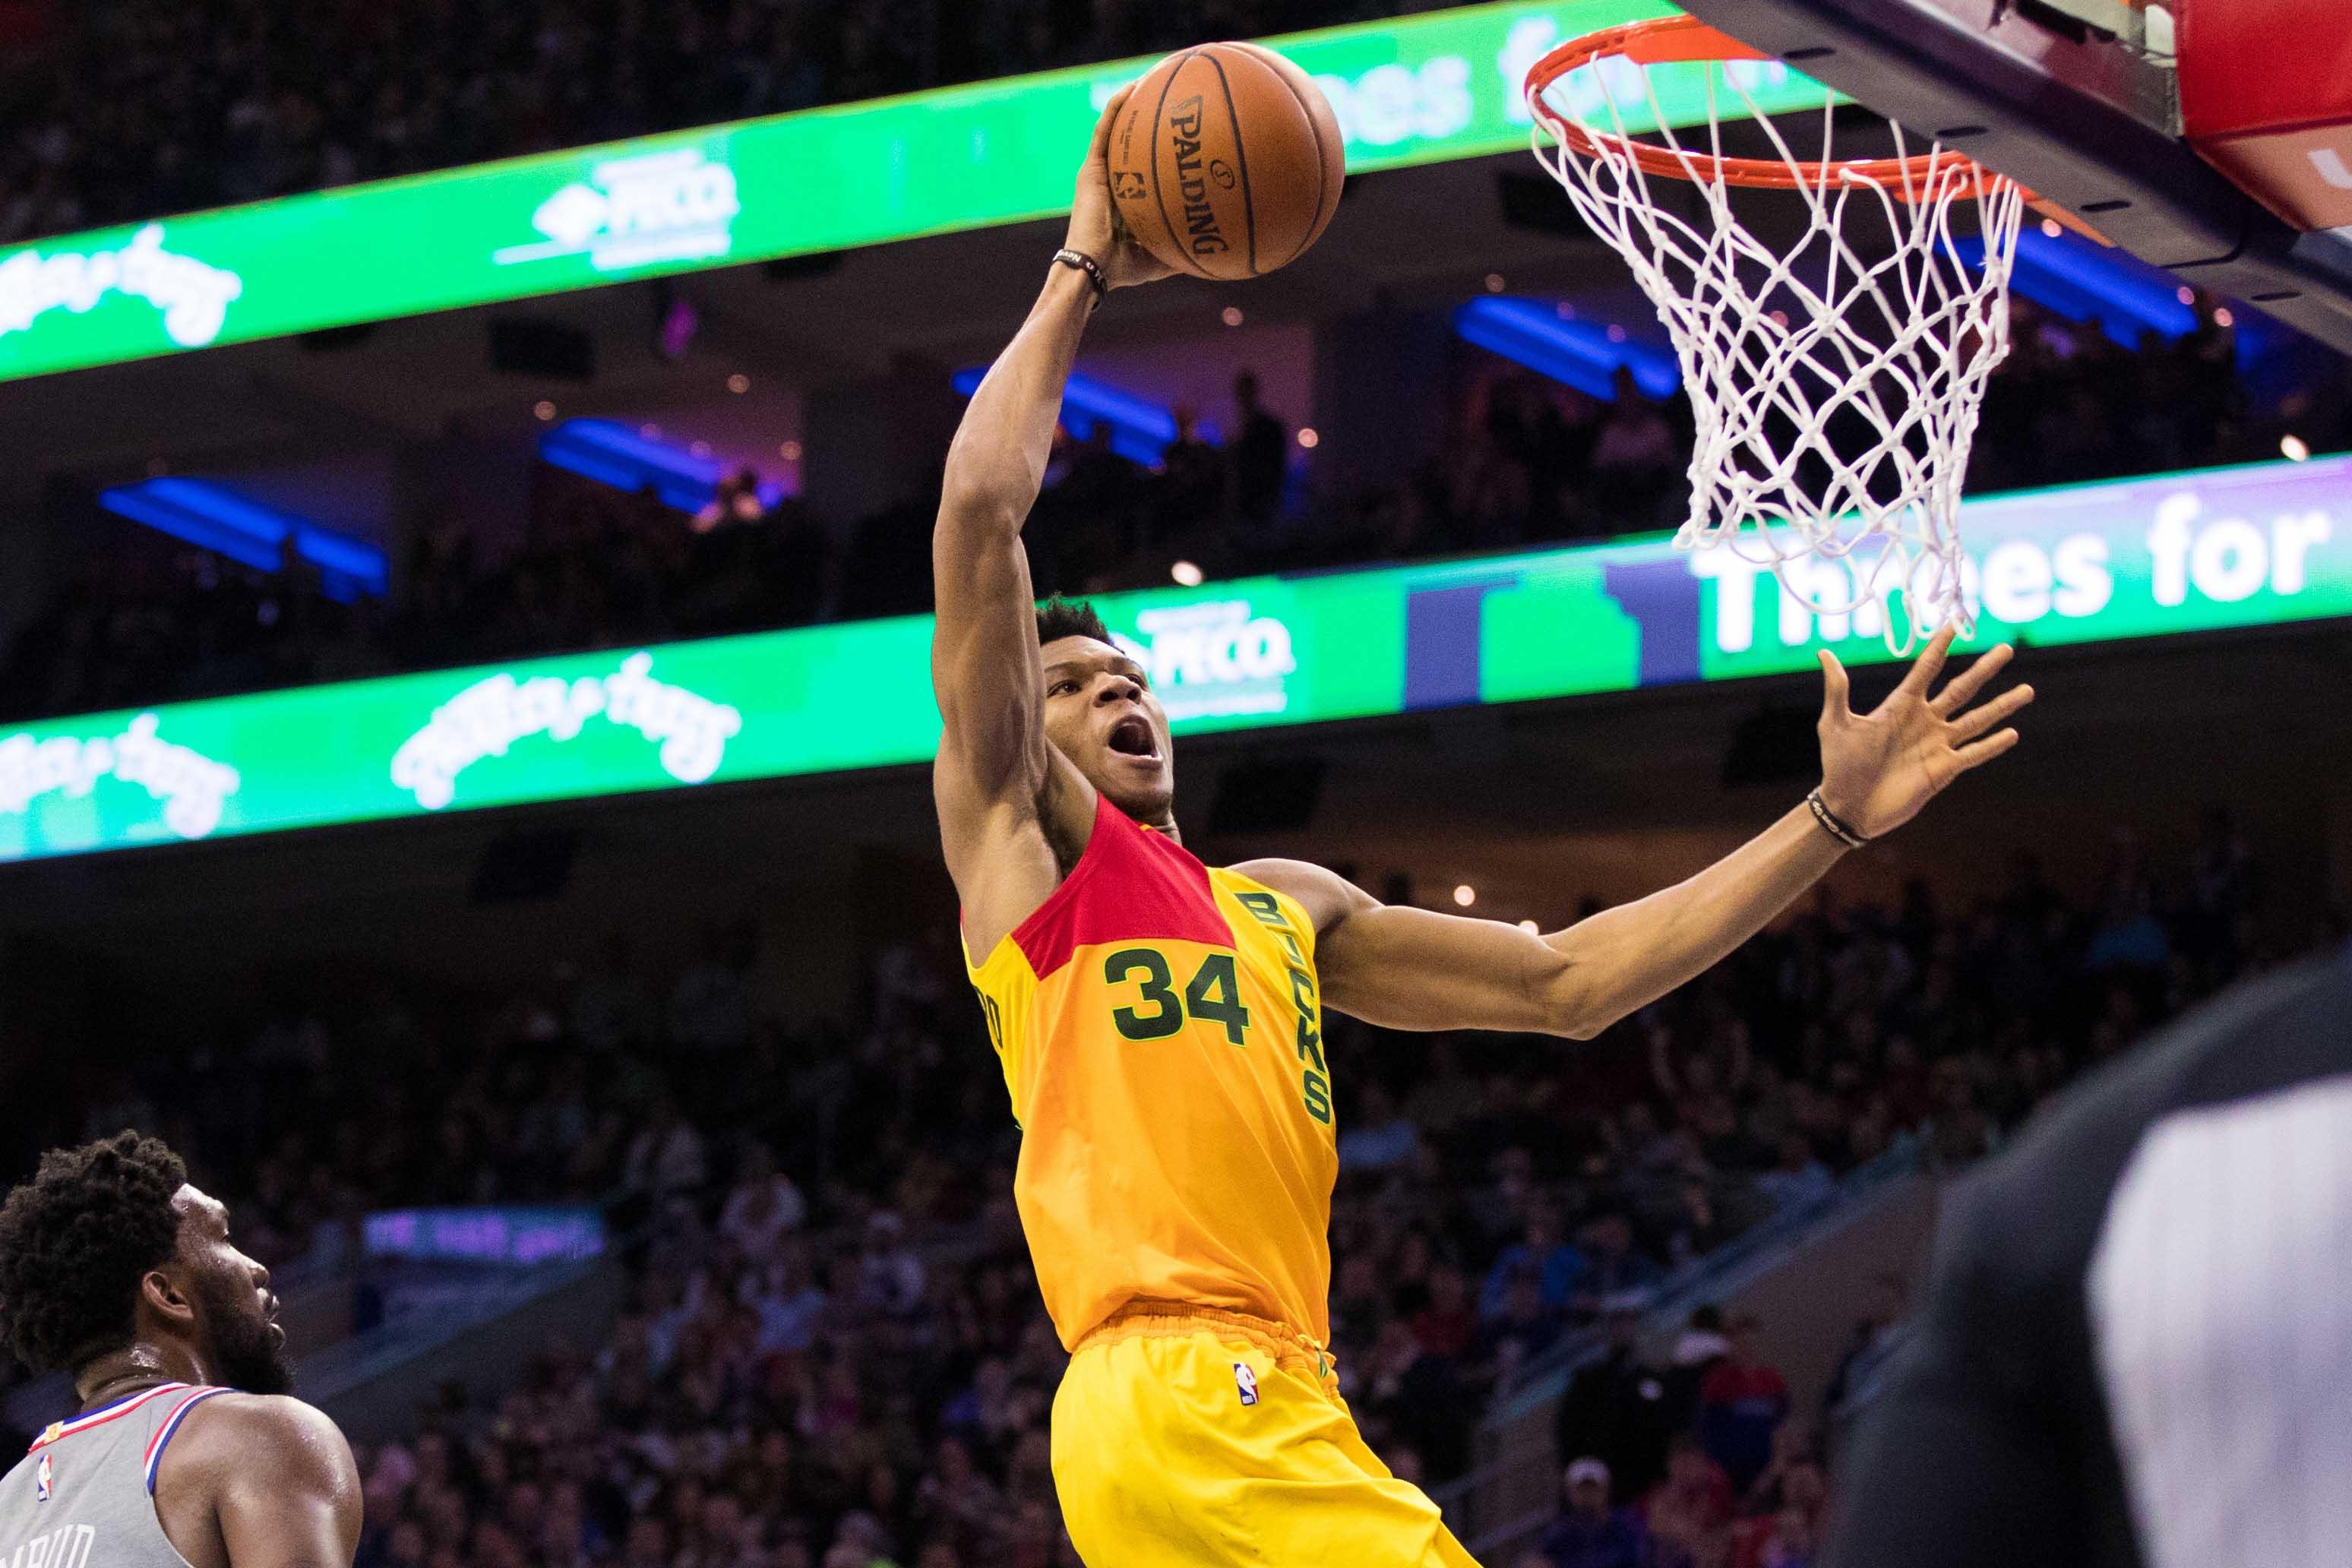 Giannis Antetokounmpo dominates, Bucks surge past 76ers to clinch NBA's best record